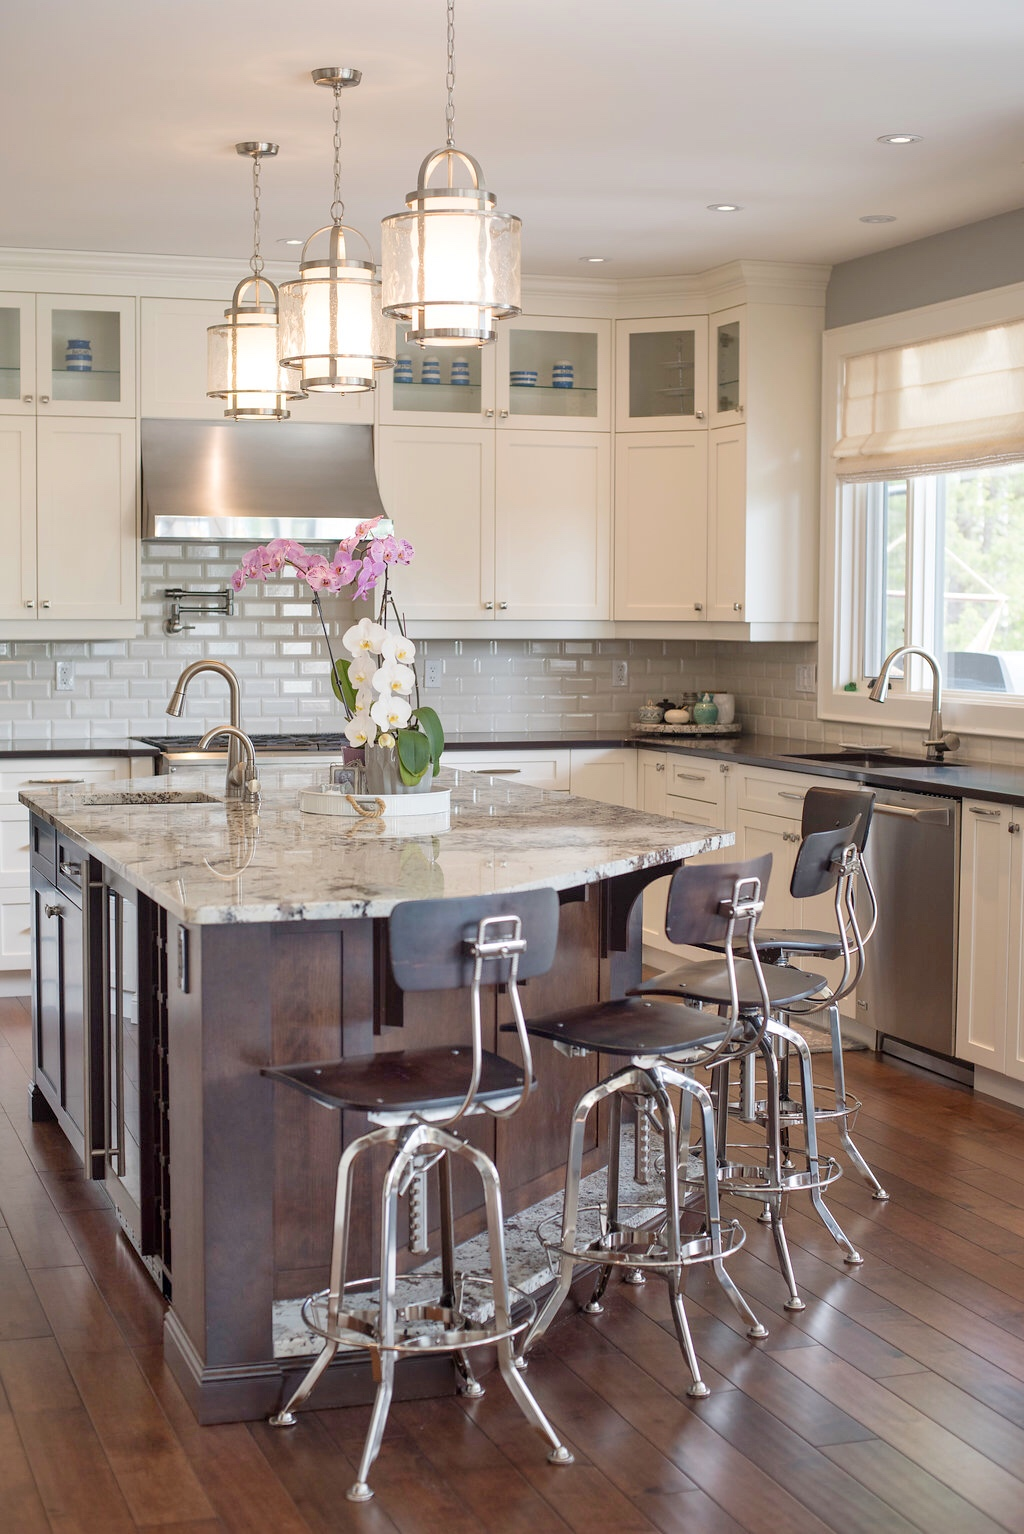 Lichen with White shaker cabinets| Pendant lighting| white subway tile backsplash| Restoration Hardware barstools| Interior Designs By Adrienne | Cranbrook BC